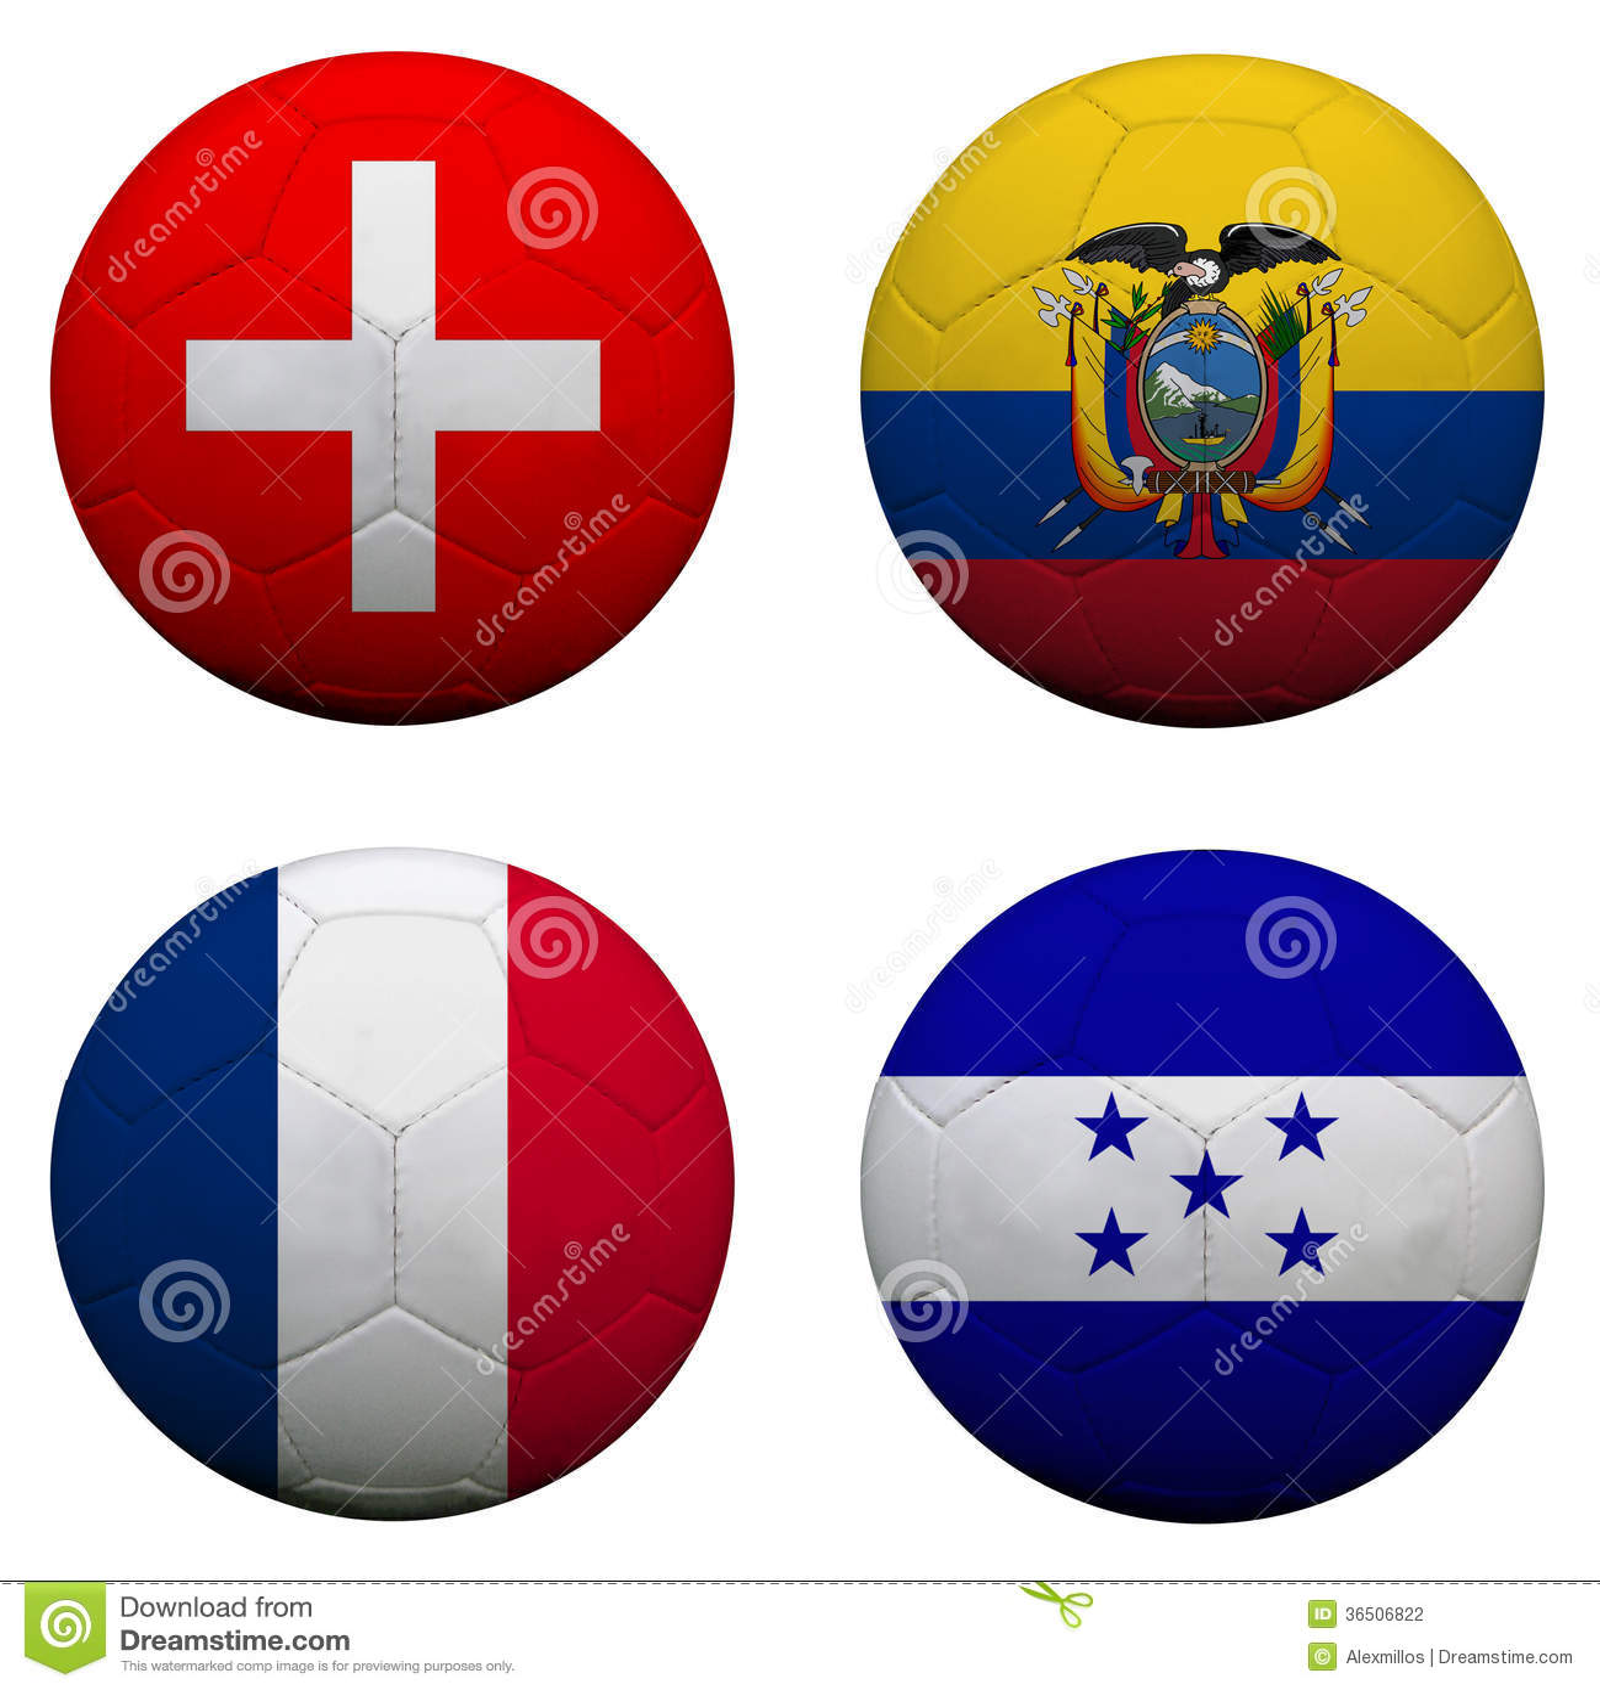 Ballons de football avec des équipes du groupe E